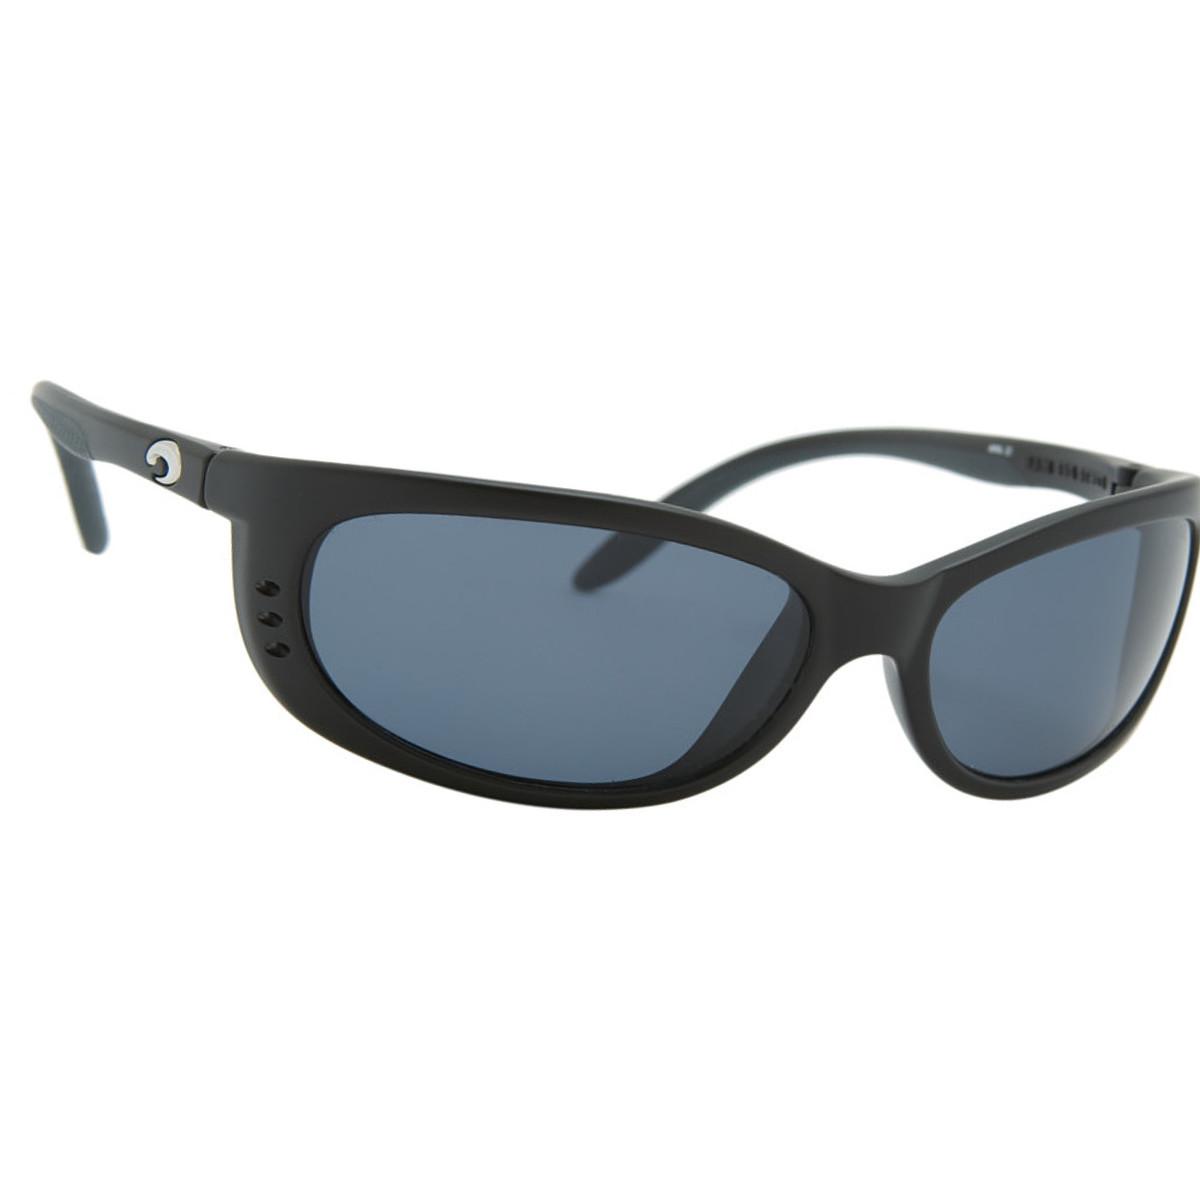 Costa Fathom 580G Polarized Sunglasses - Women's